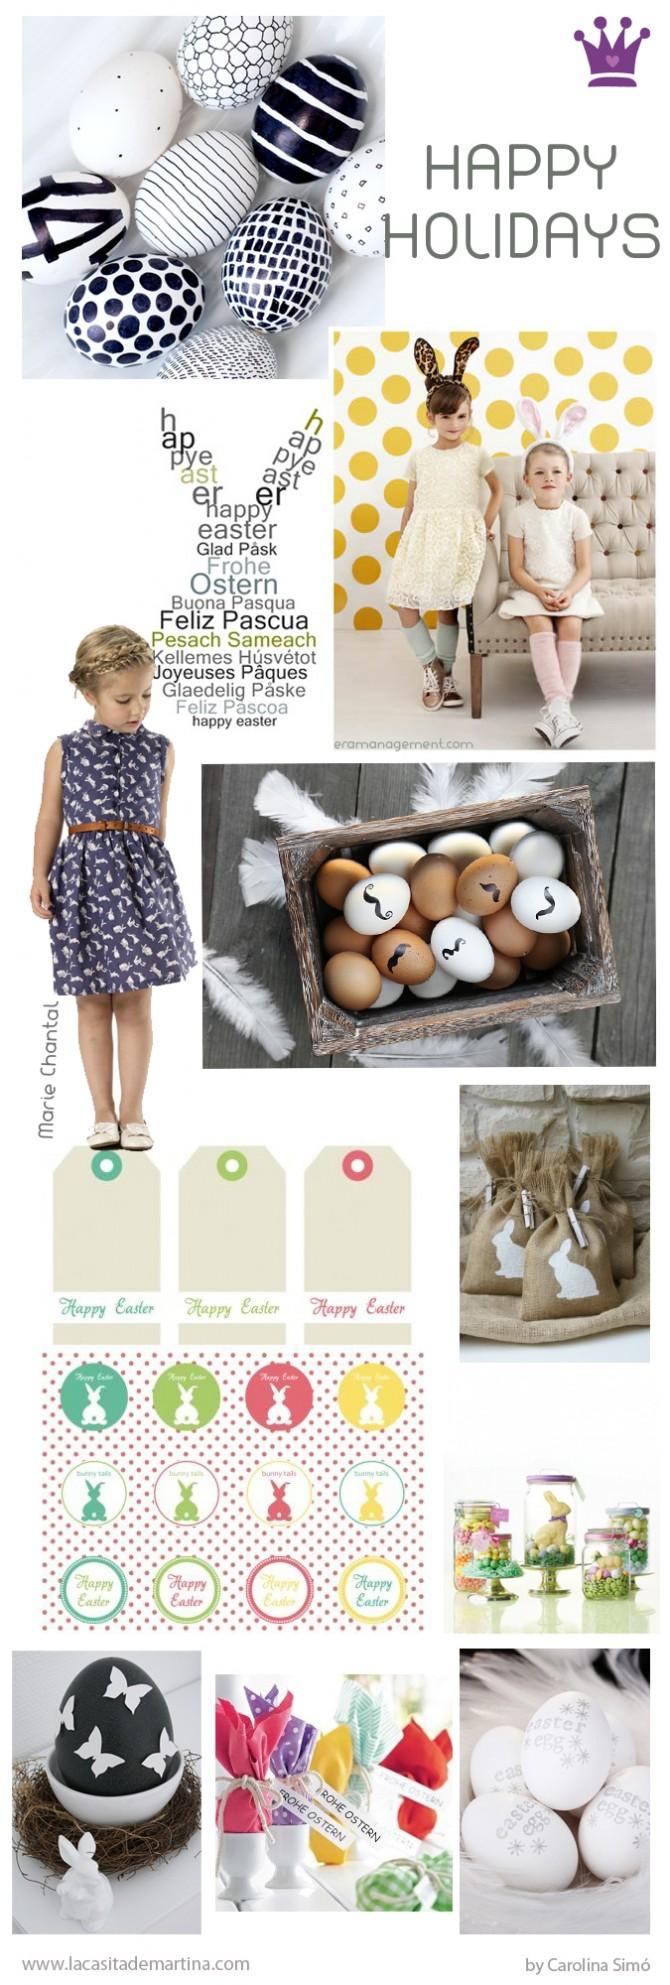 Pascua, La casita de Martina,    Blog de Moda Infantil,   Carolina Simó